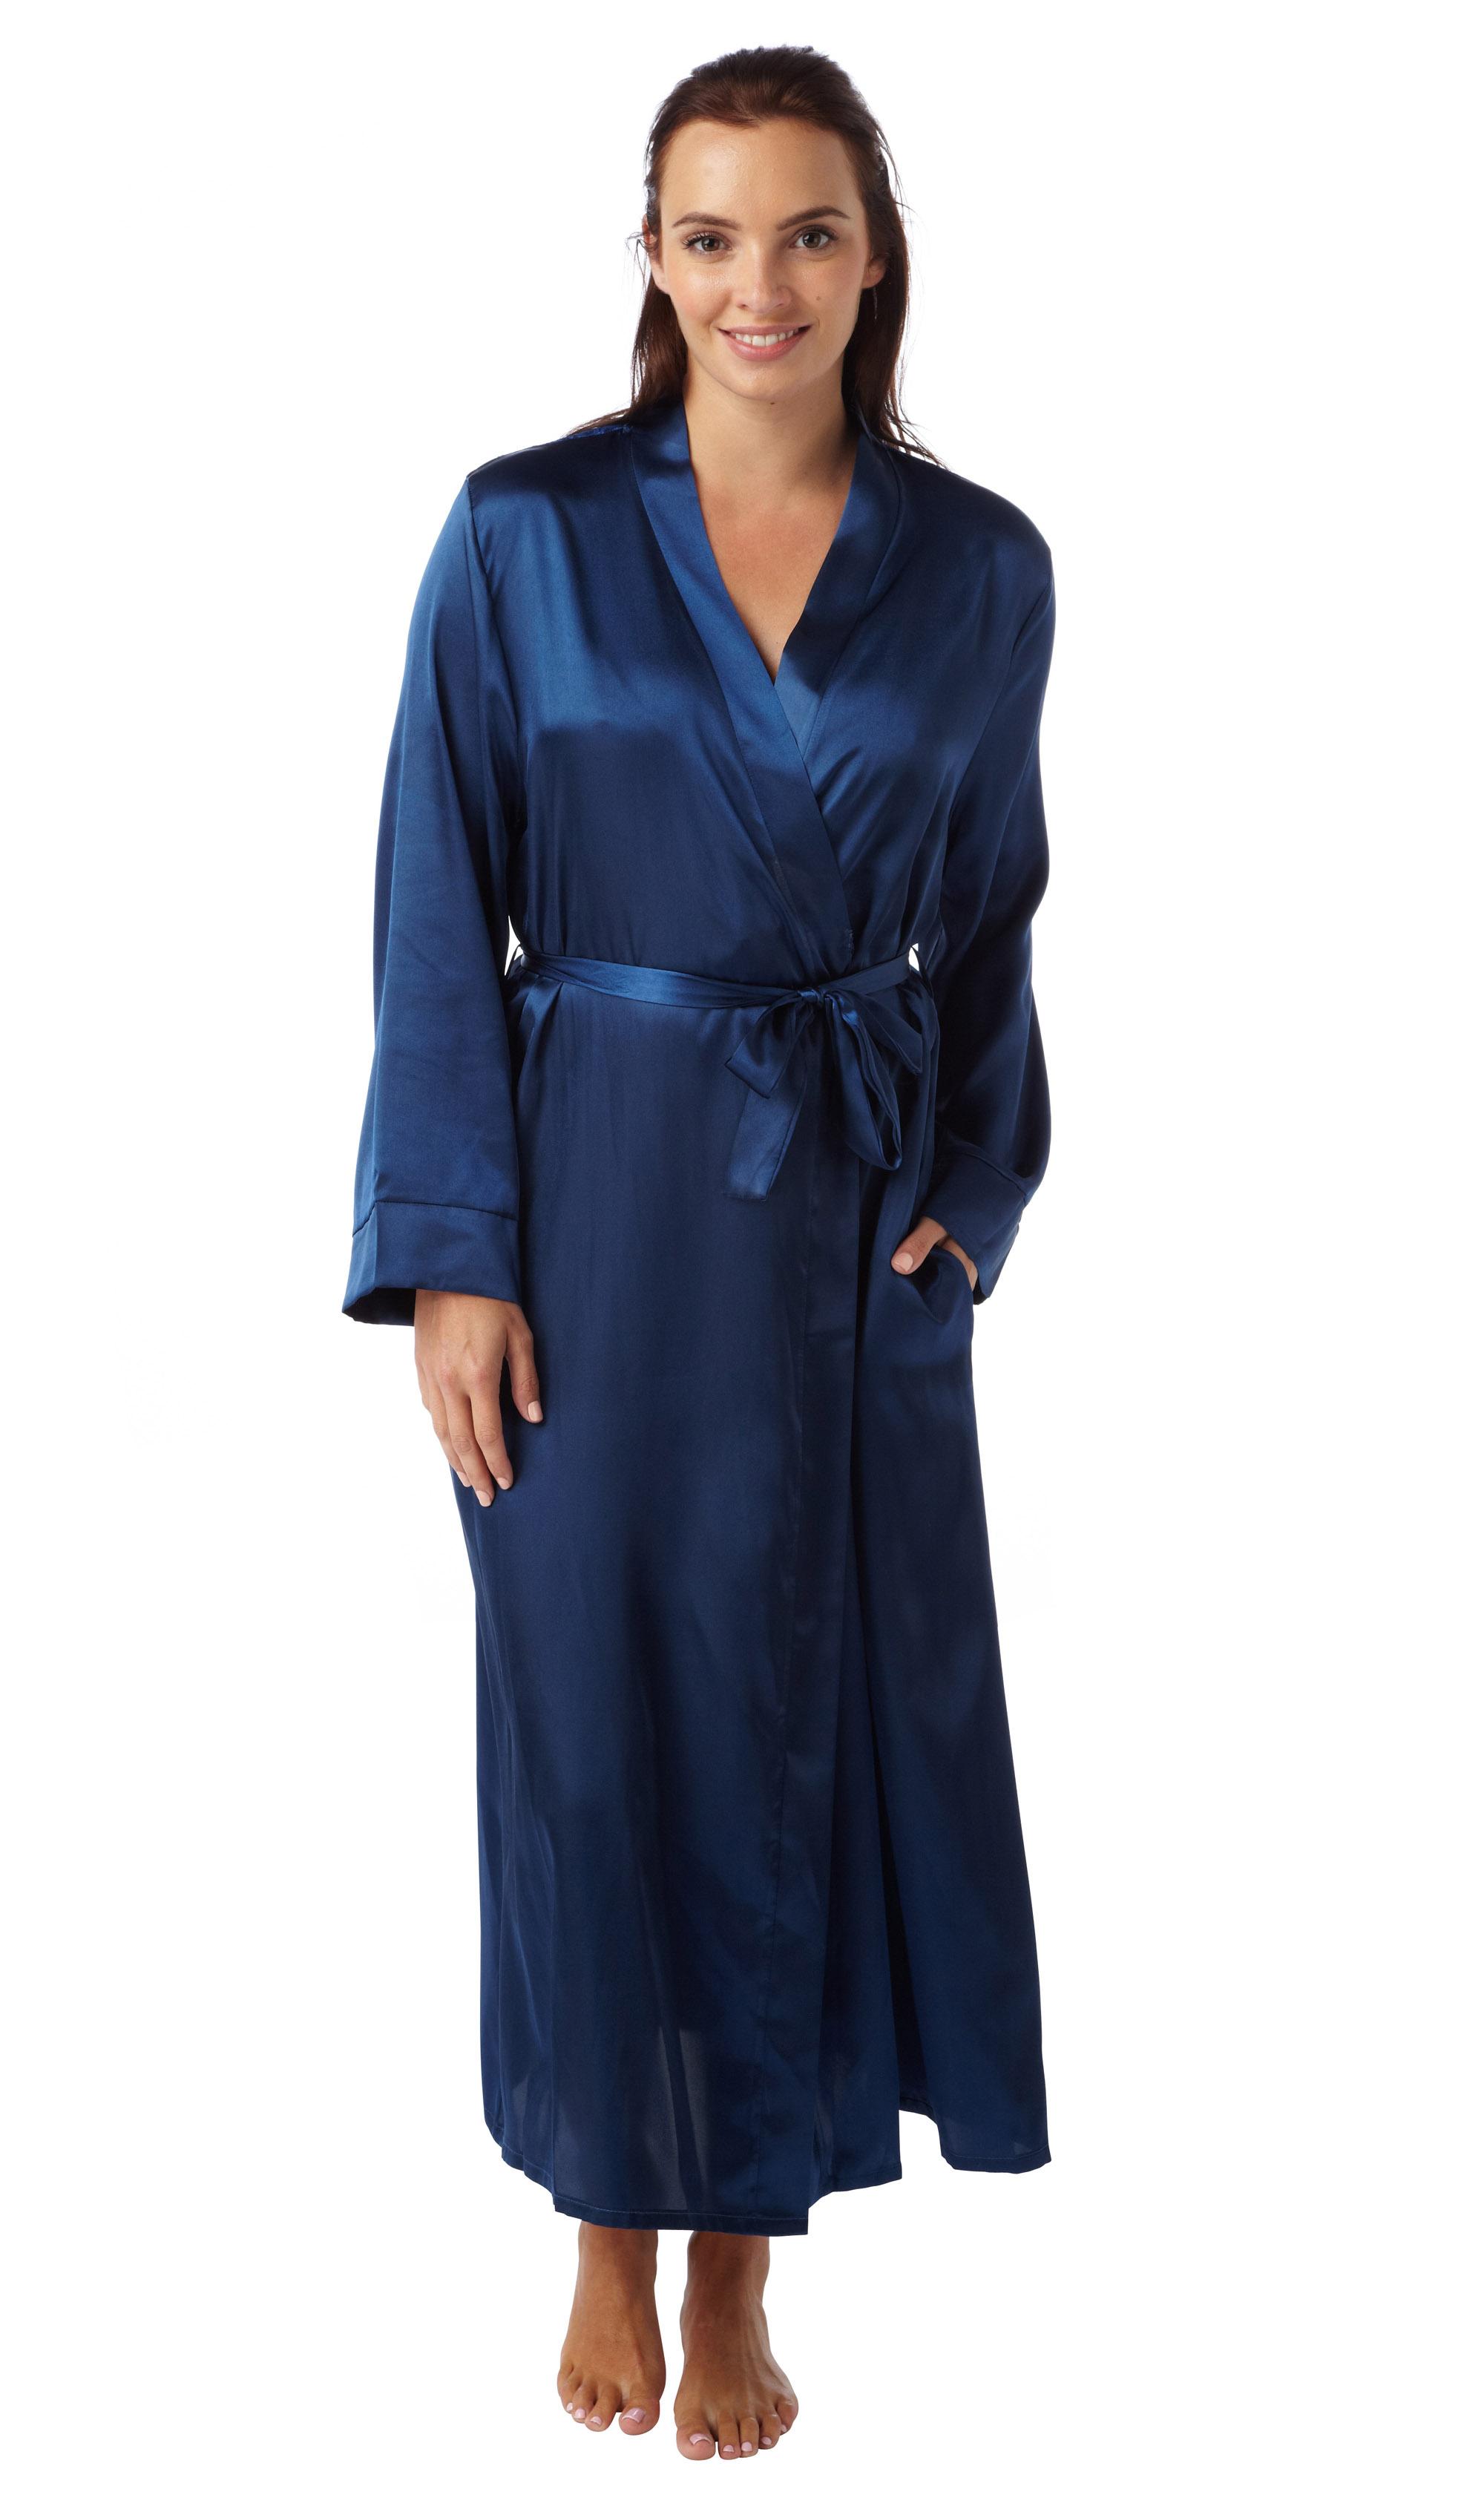 Women\'s Ladies Luxury Soft Satin Lace Detail Wrap Dressing Gown Mn61 ...